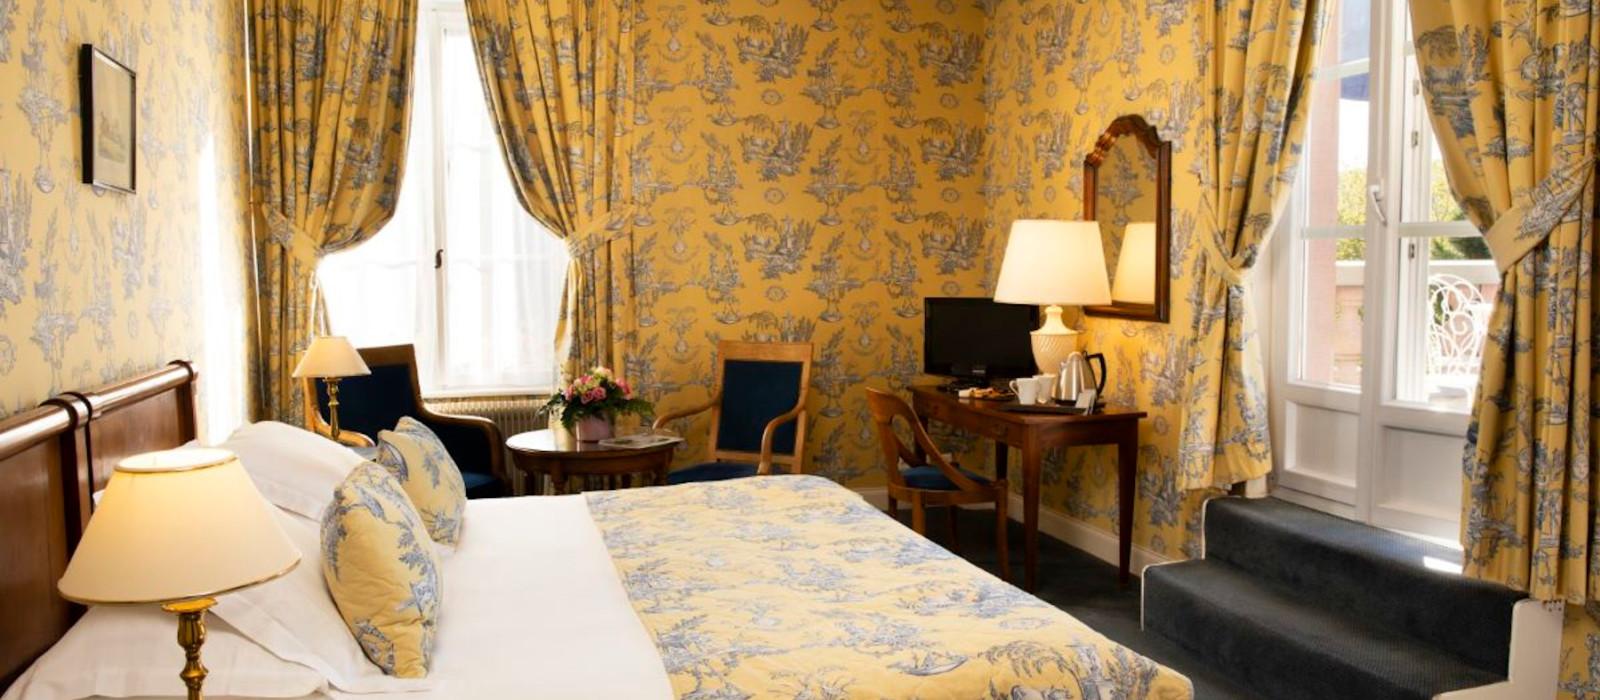 Hotel Chateau d'Isenbourg France